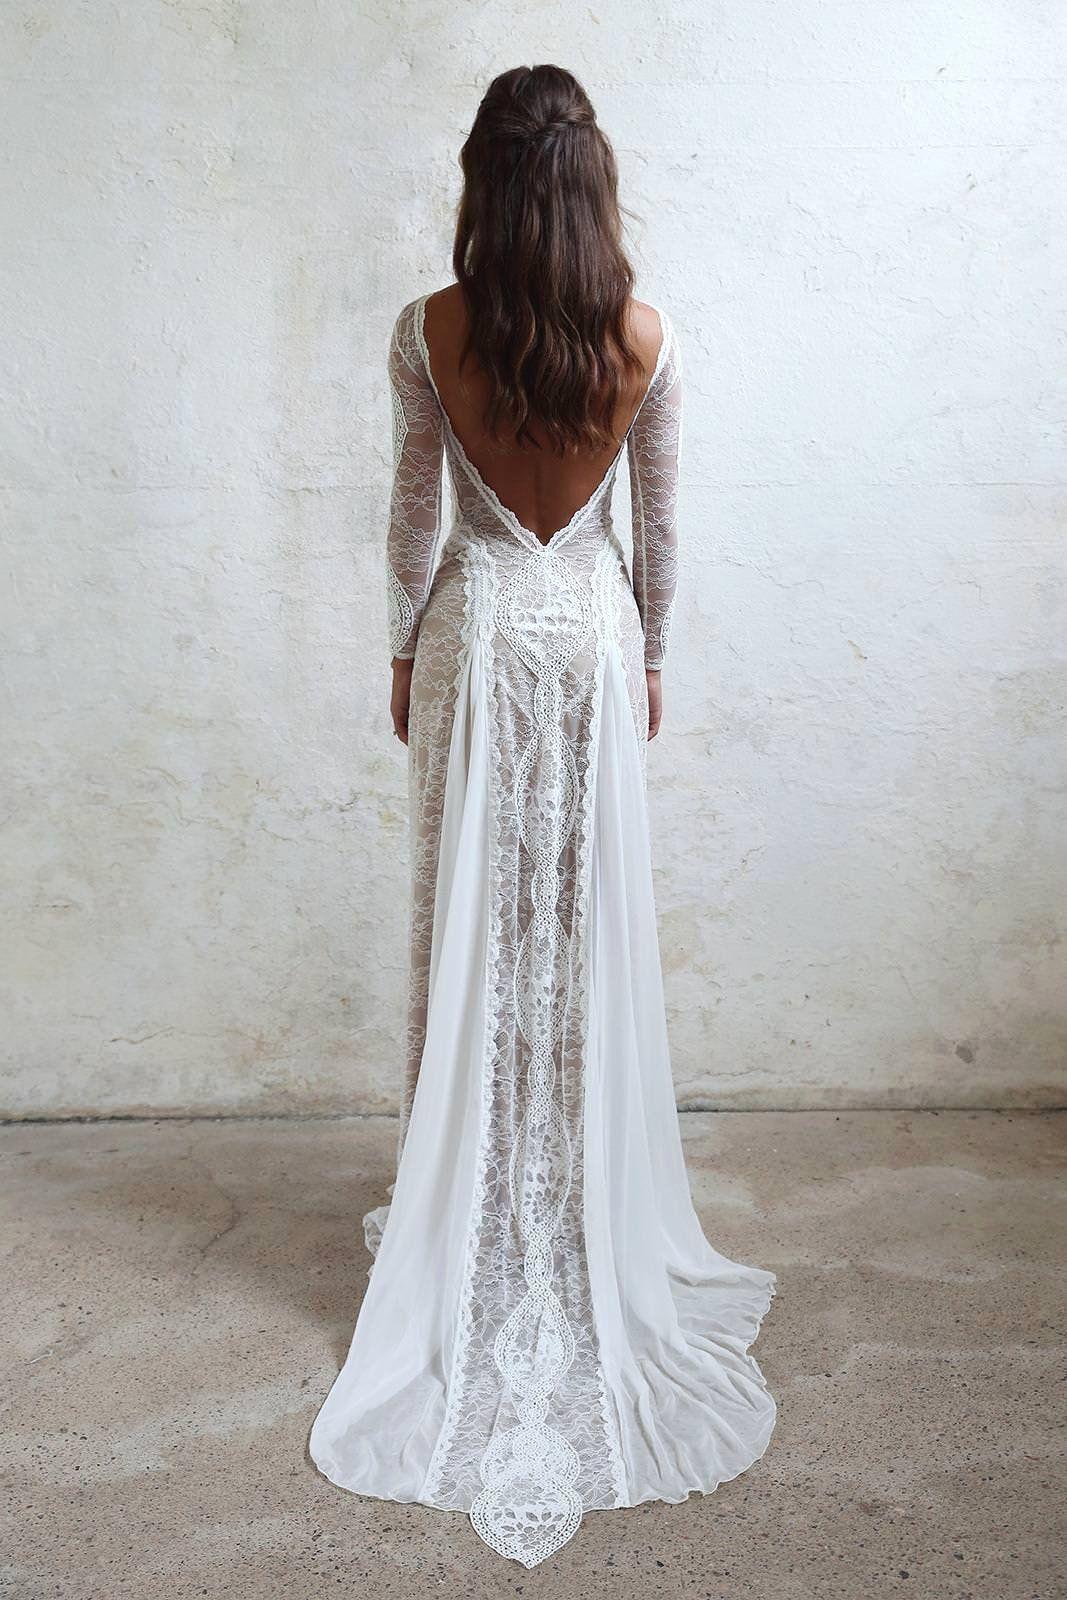 Average Cost Of Wedding Dress Alterations New Inca Best